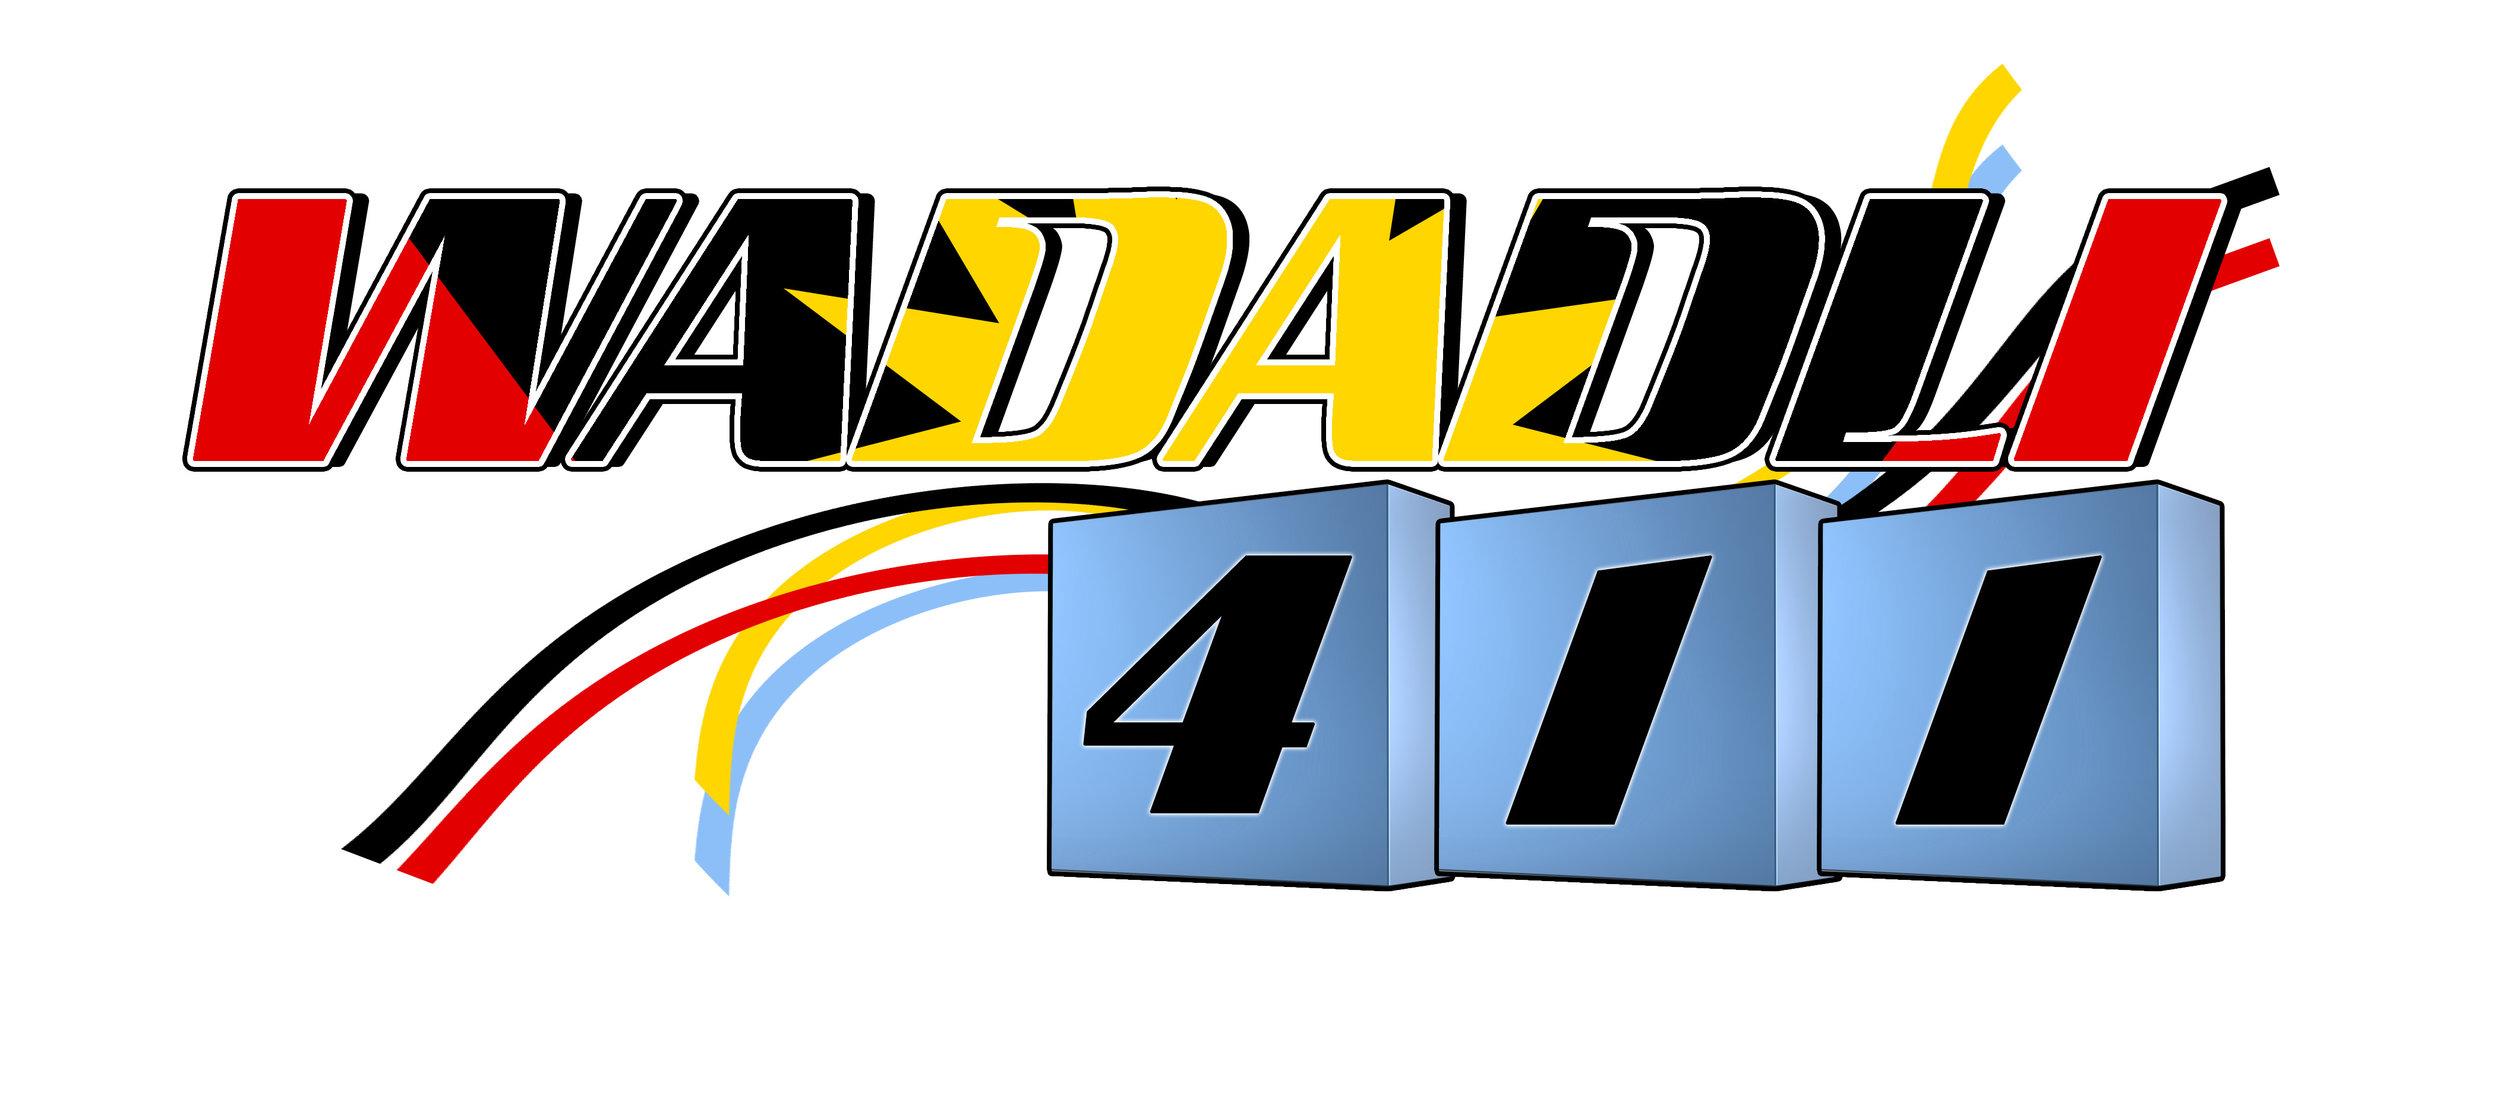 WADADLI411 LOGO.jpg